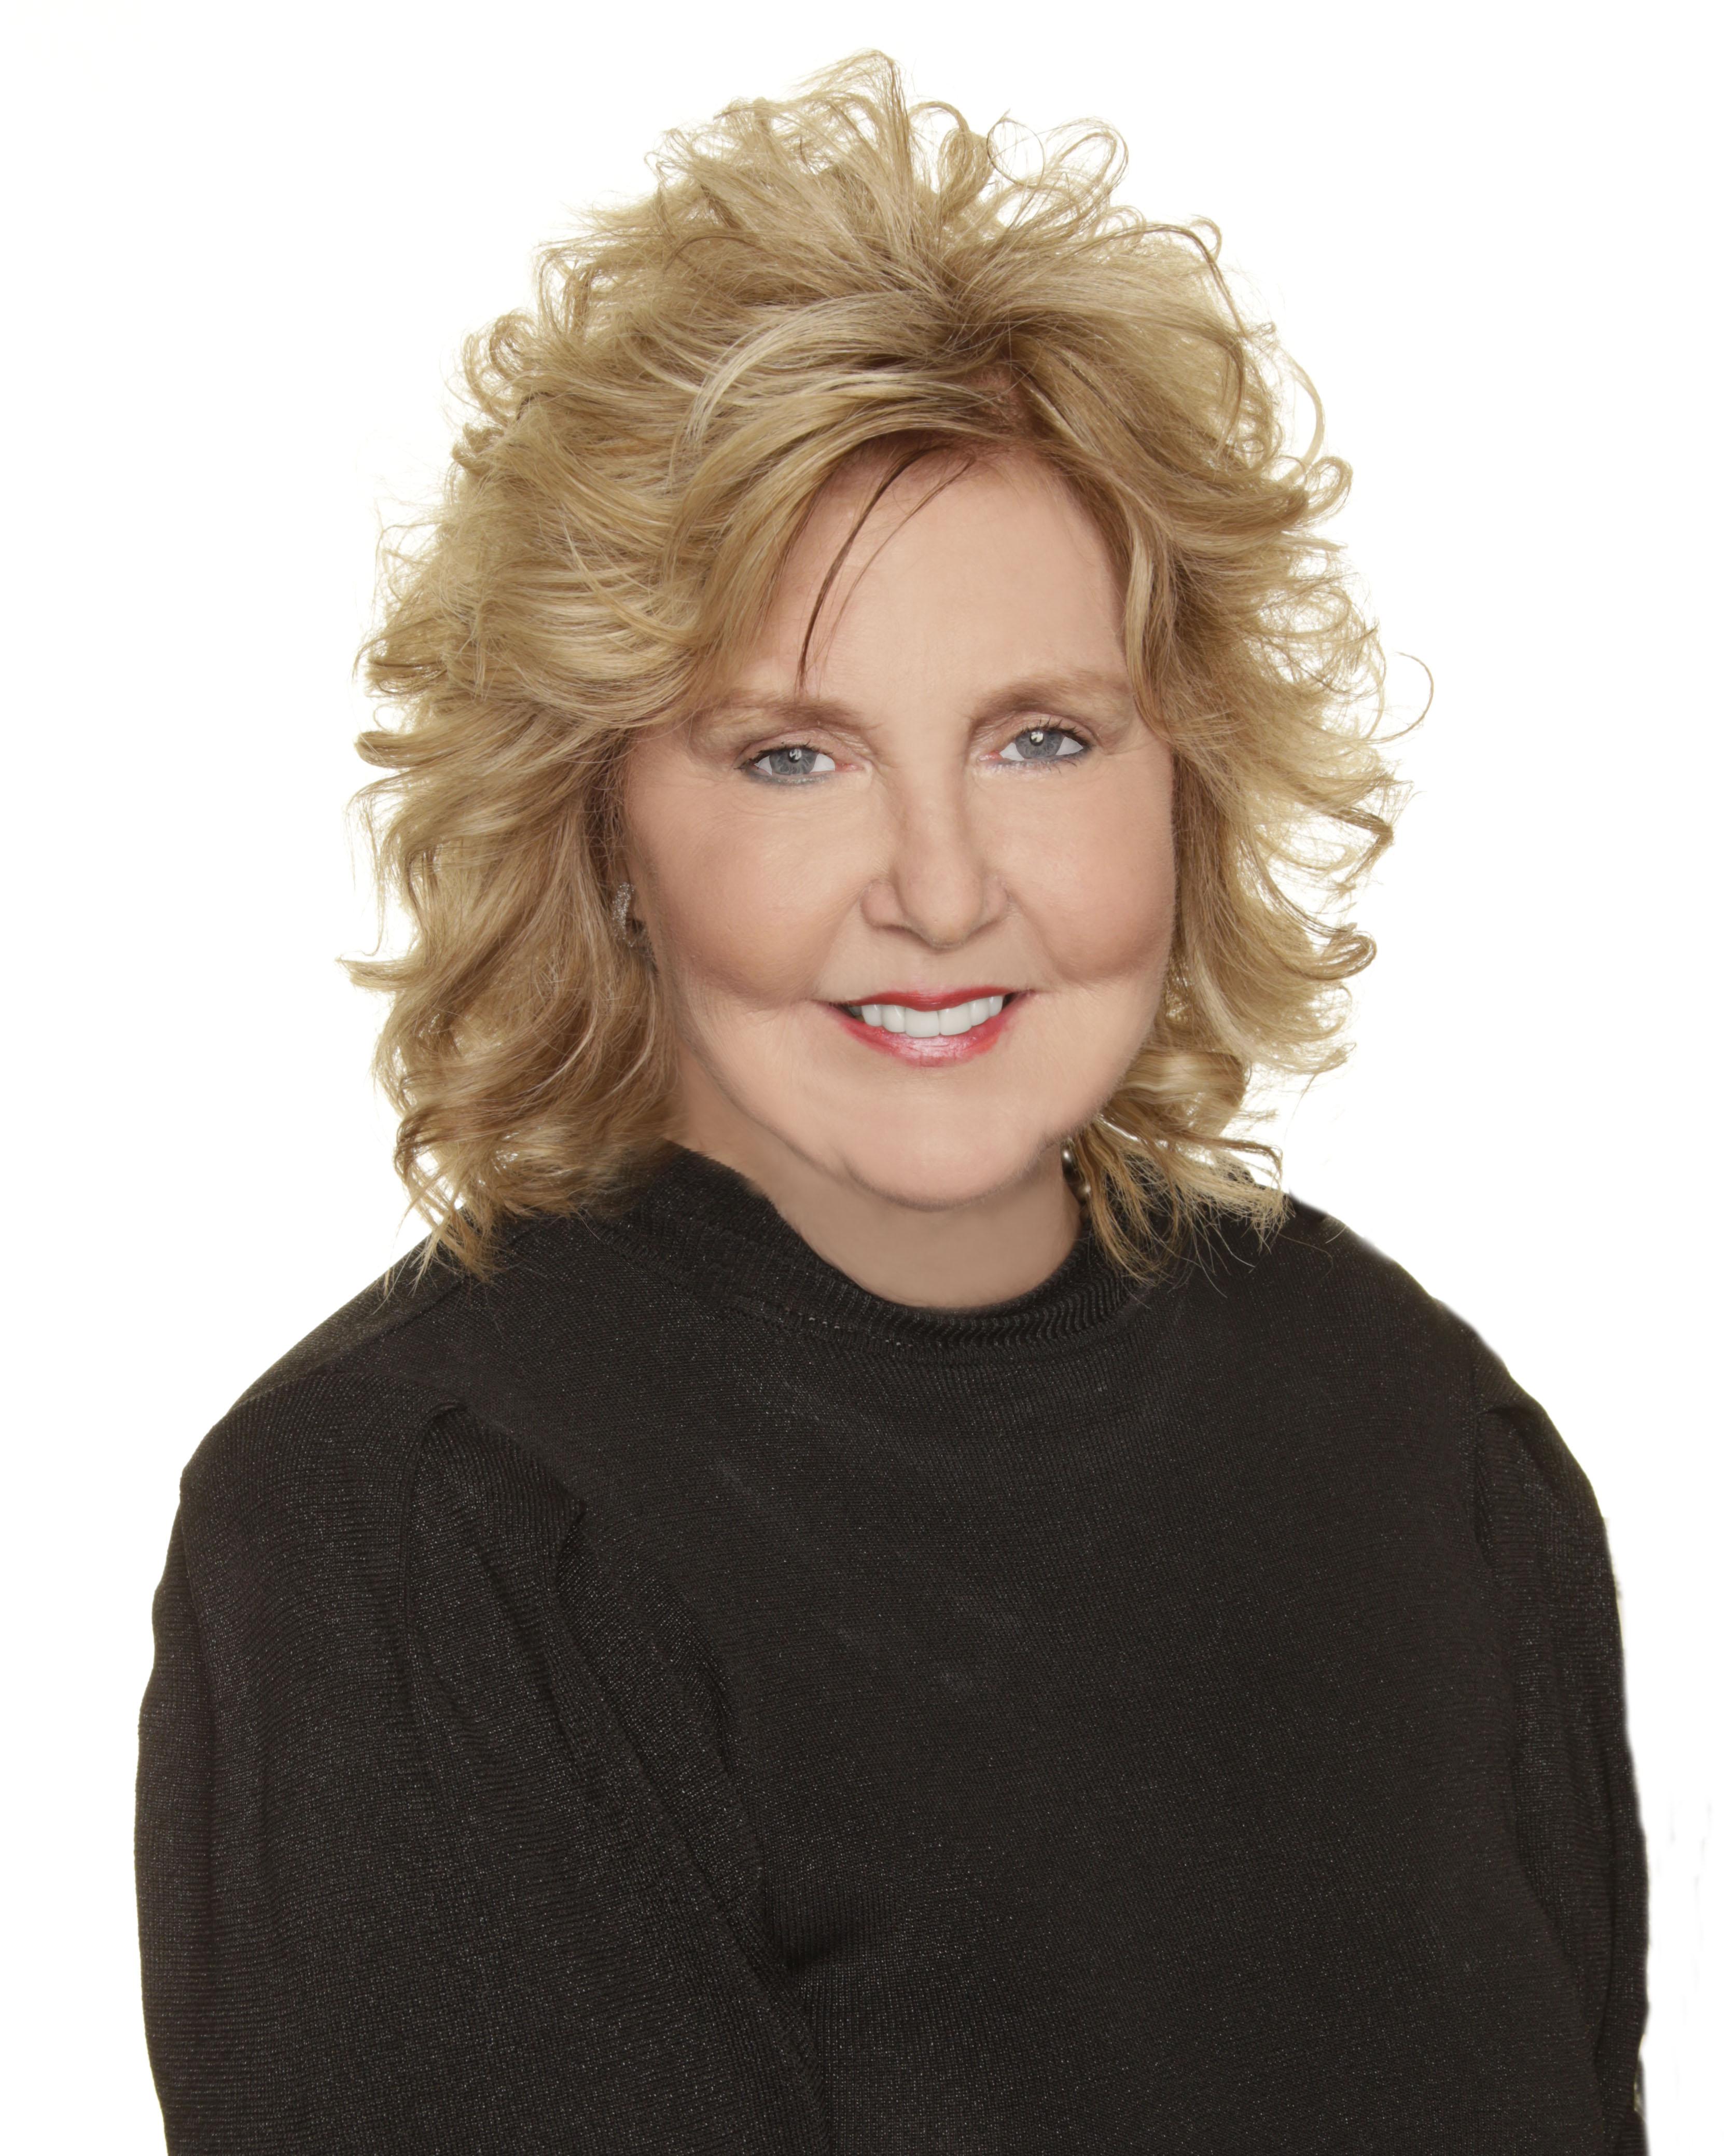 Nancy undefined Simpkins